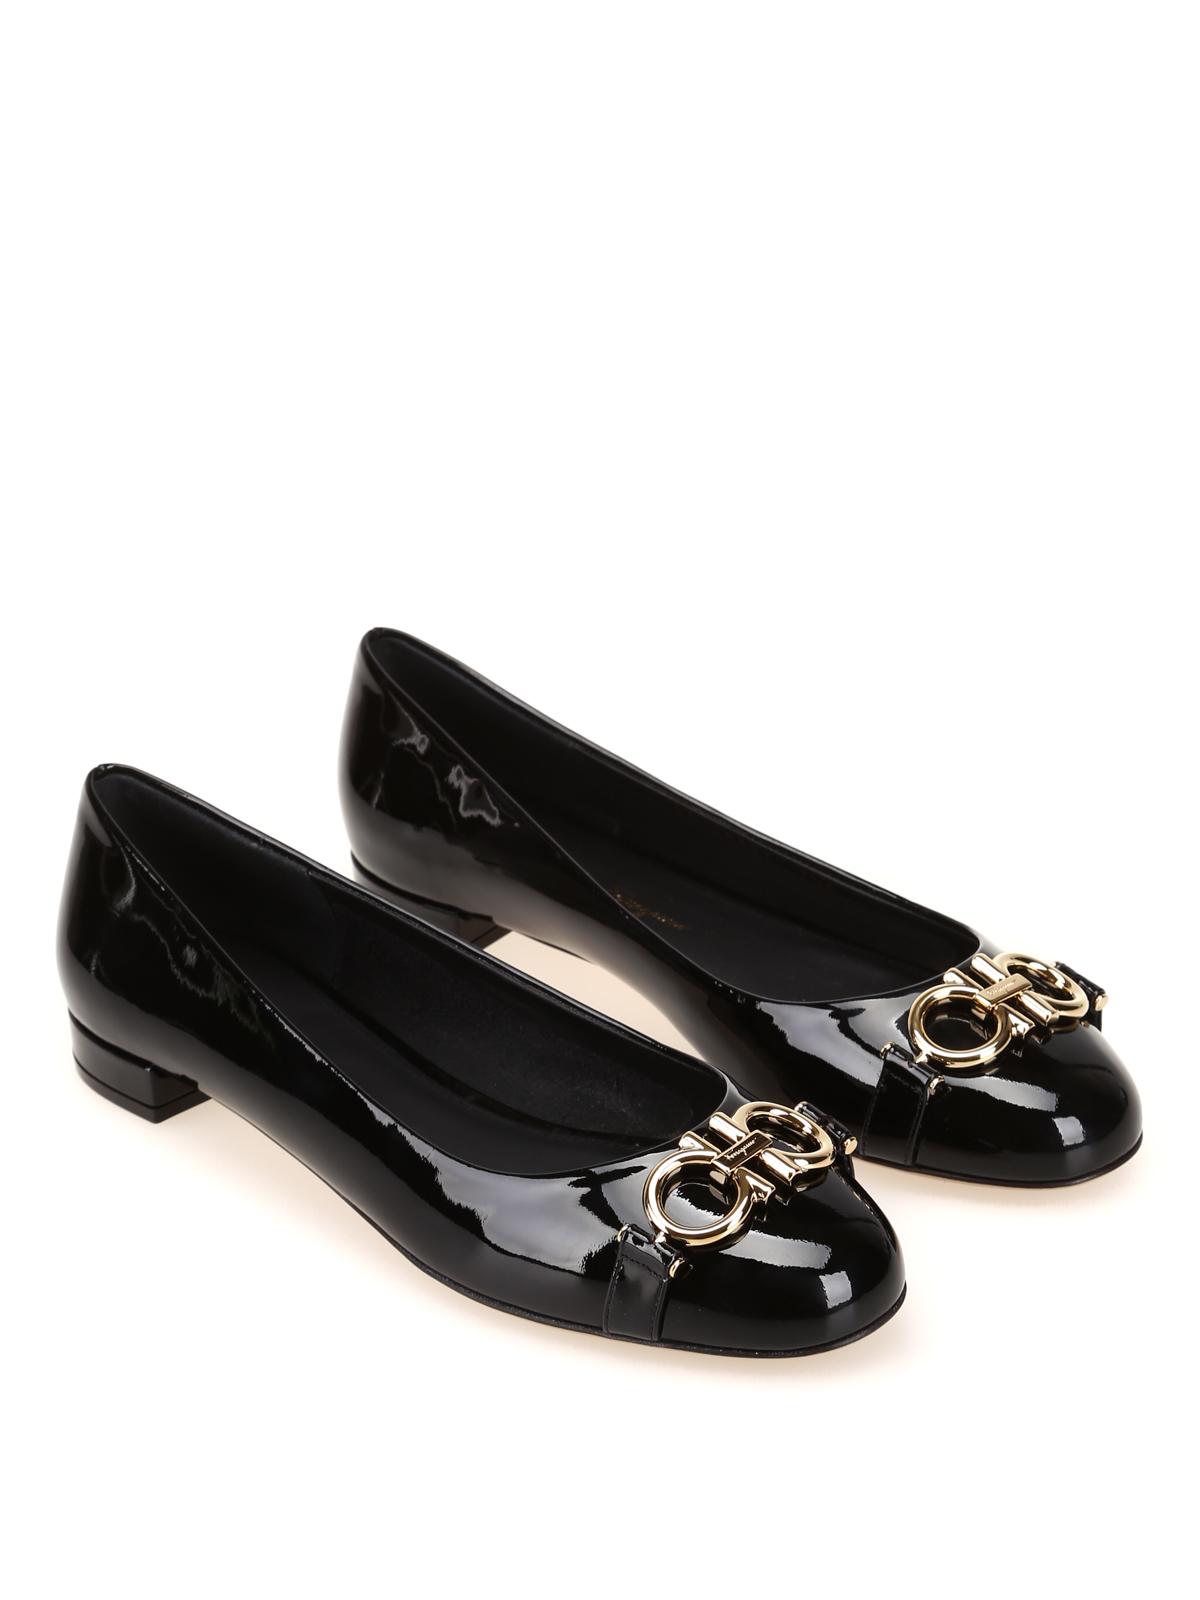 salvatore ferragamo shoes online